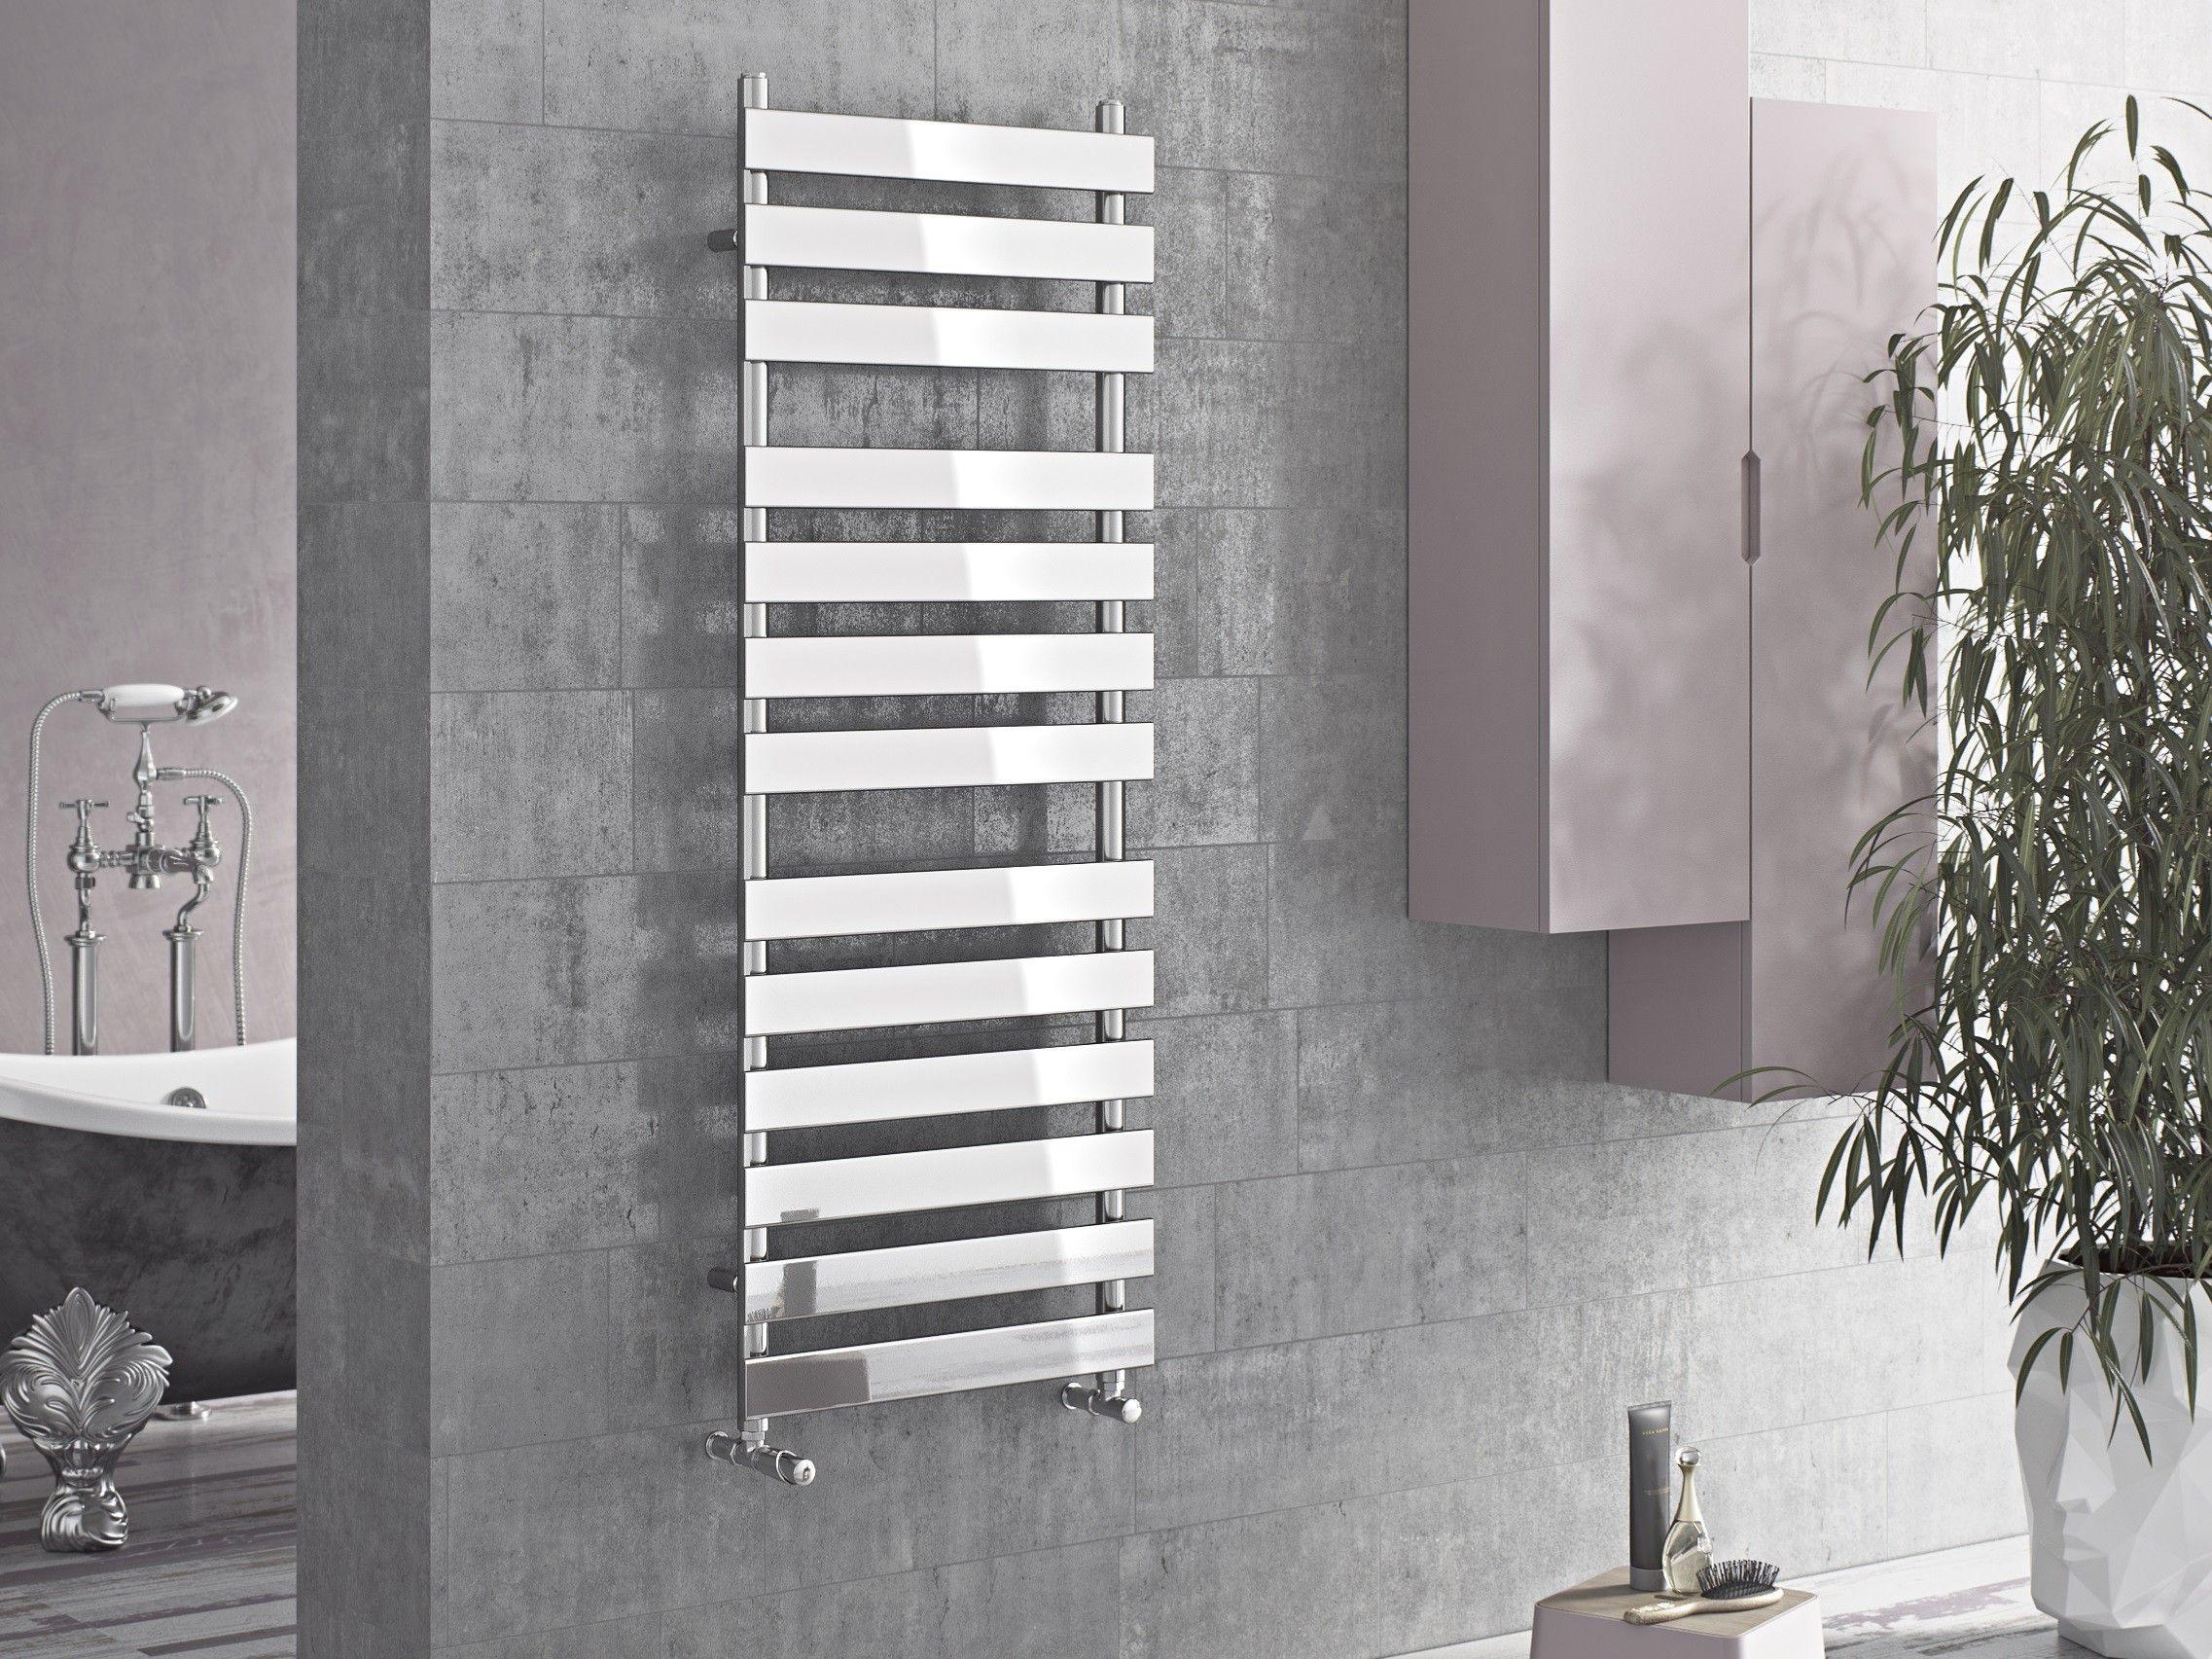 badheizk rper paneel chrom 1300 x 500 mm 483 watt in 2018 badheizk rper pinterest heizstab. Black Bedroom Furniture Sets. Home Design Ideas